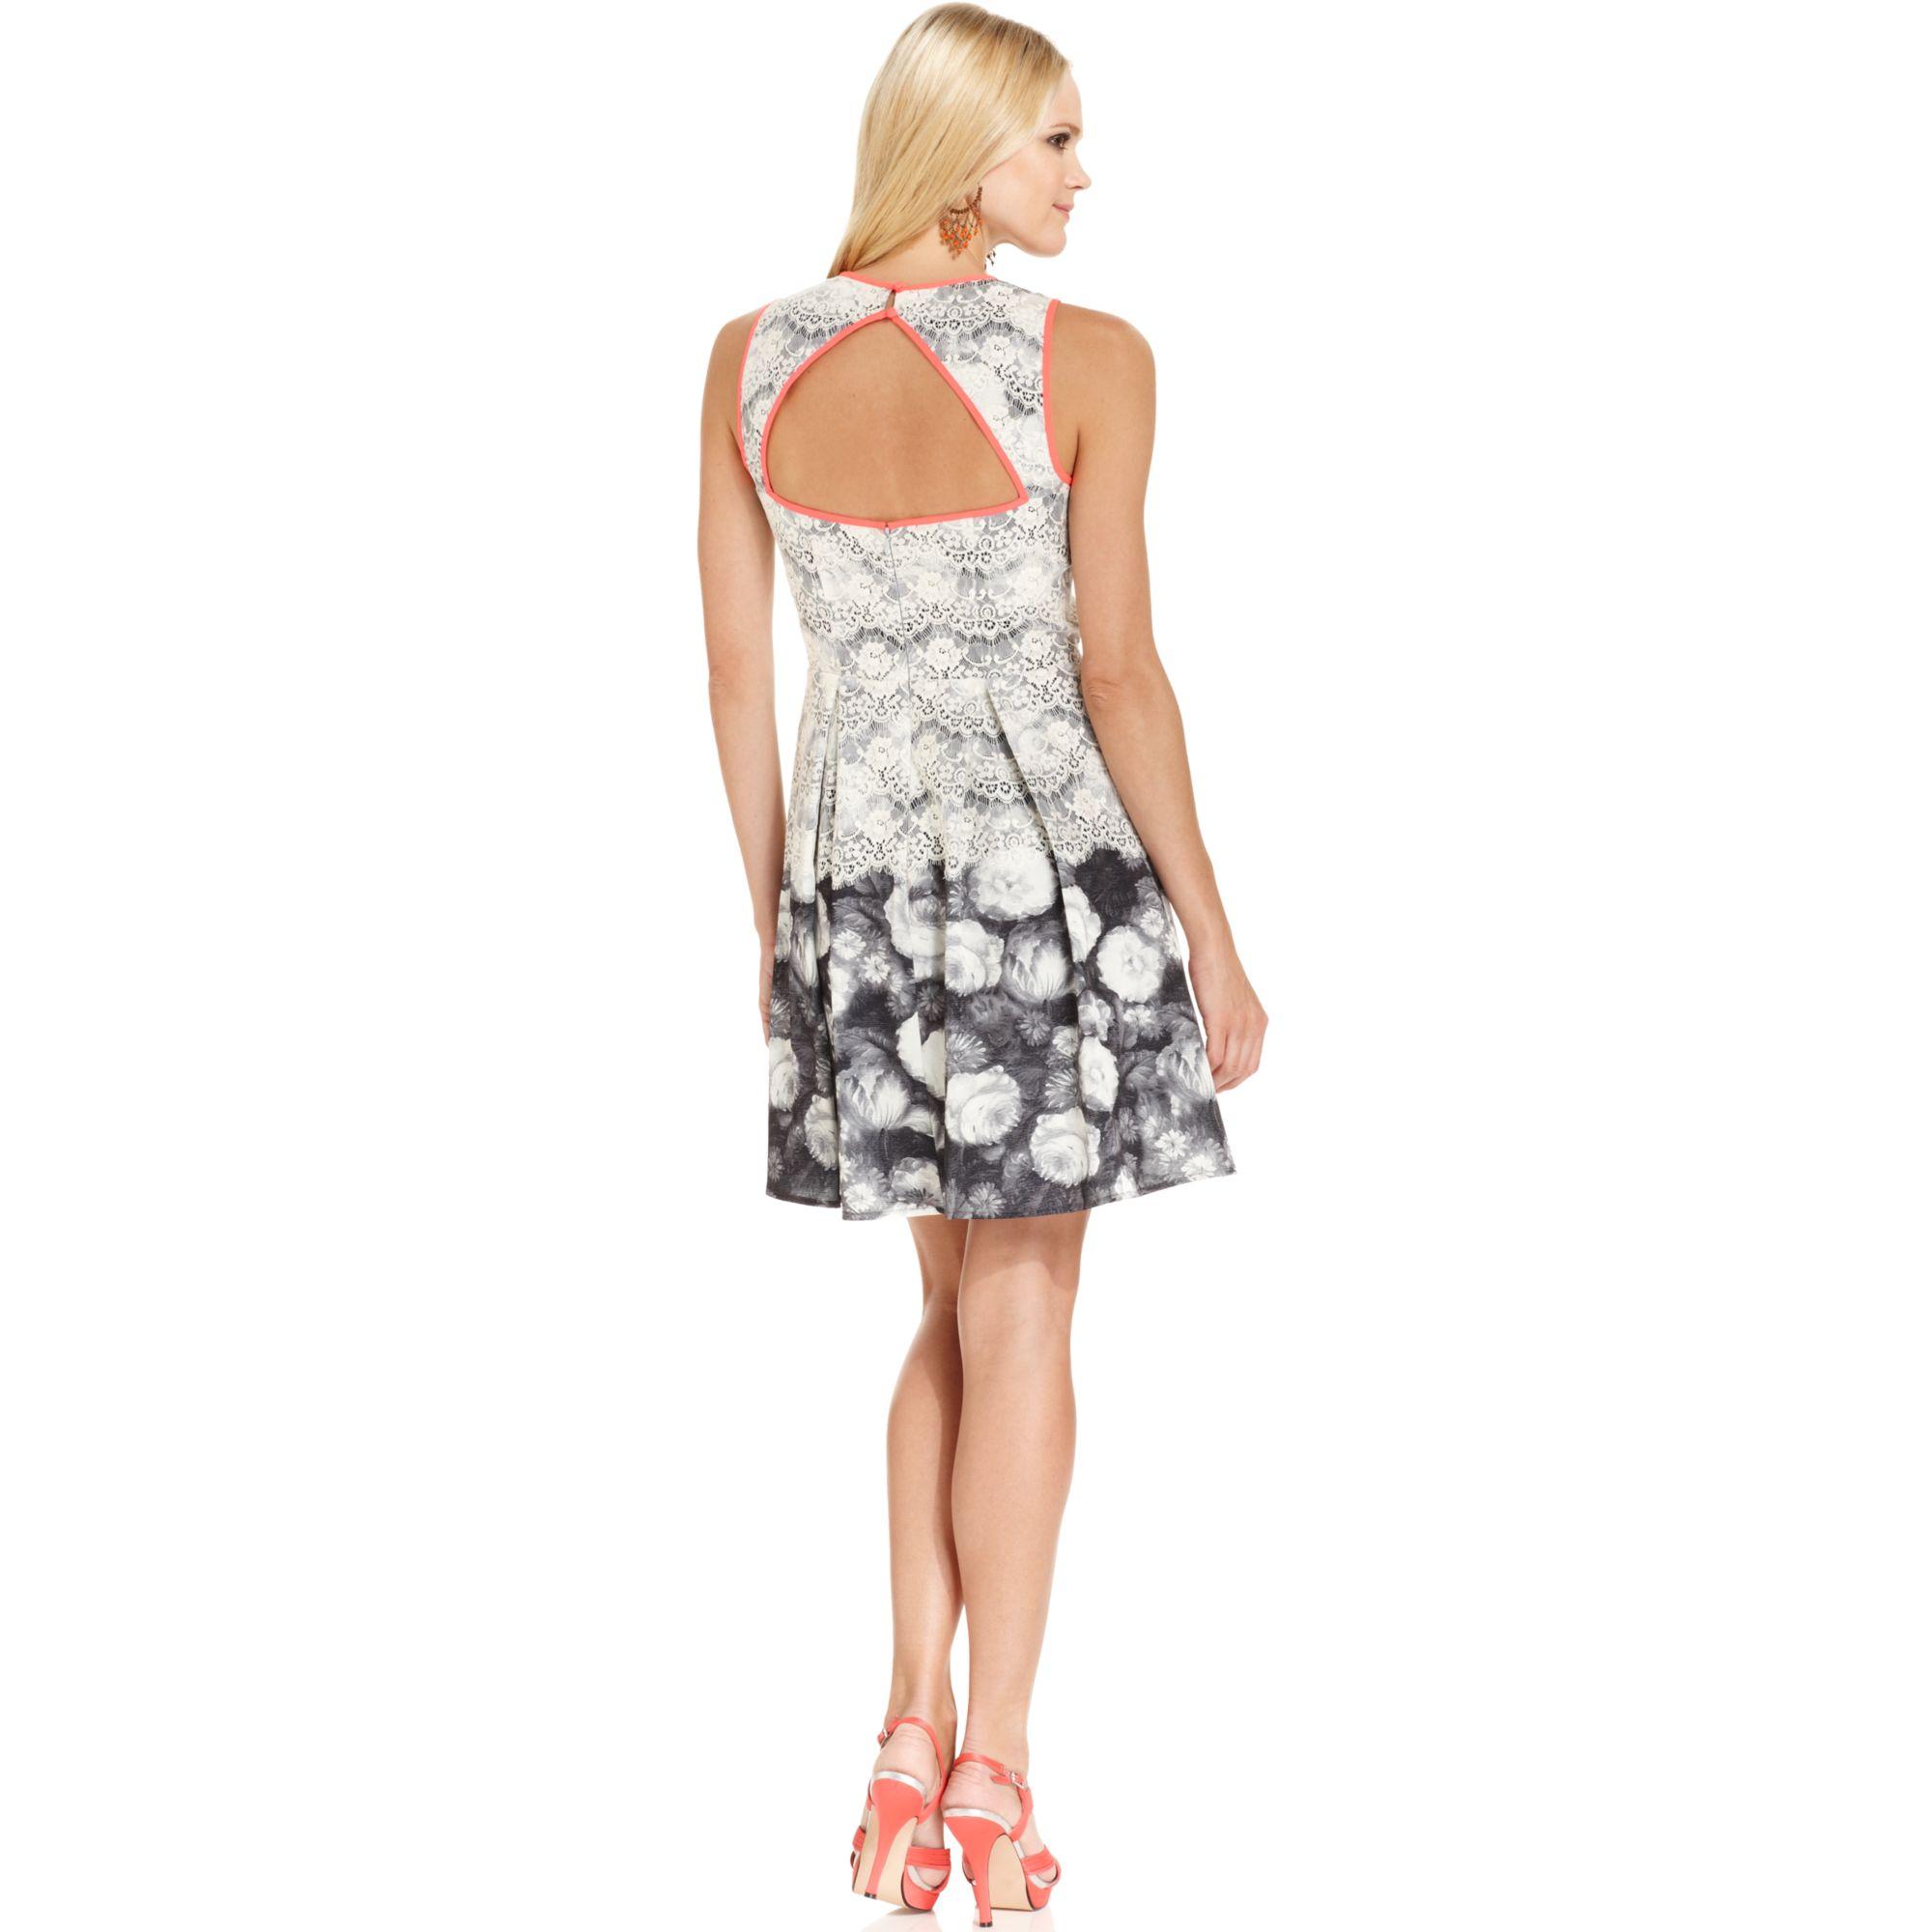 Jessica Simpson Sleeveless Lace Floralprint Dress In White